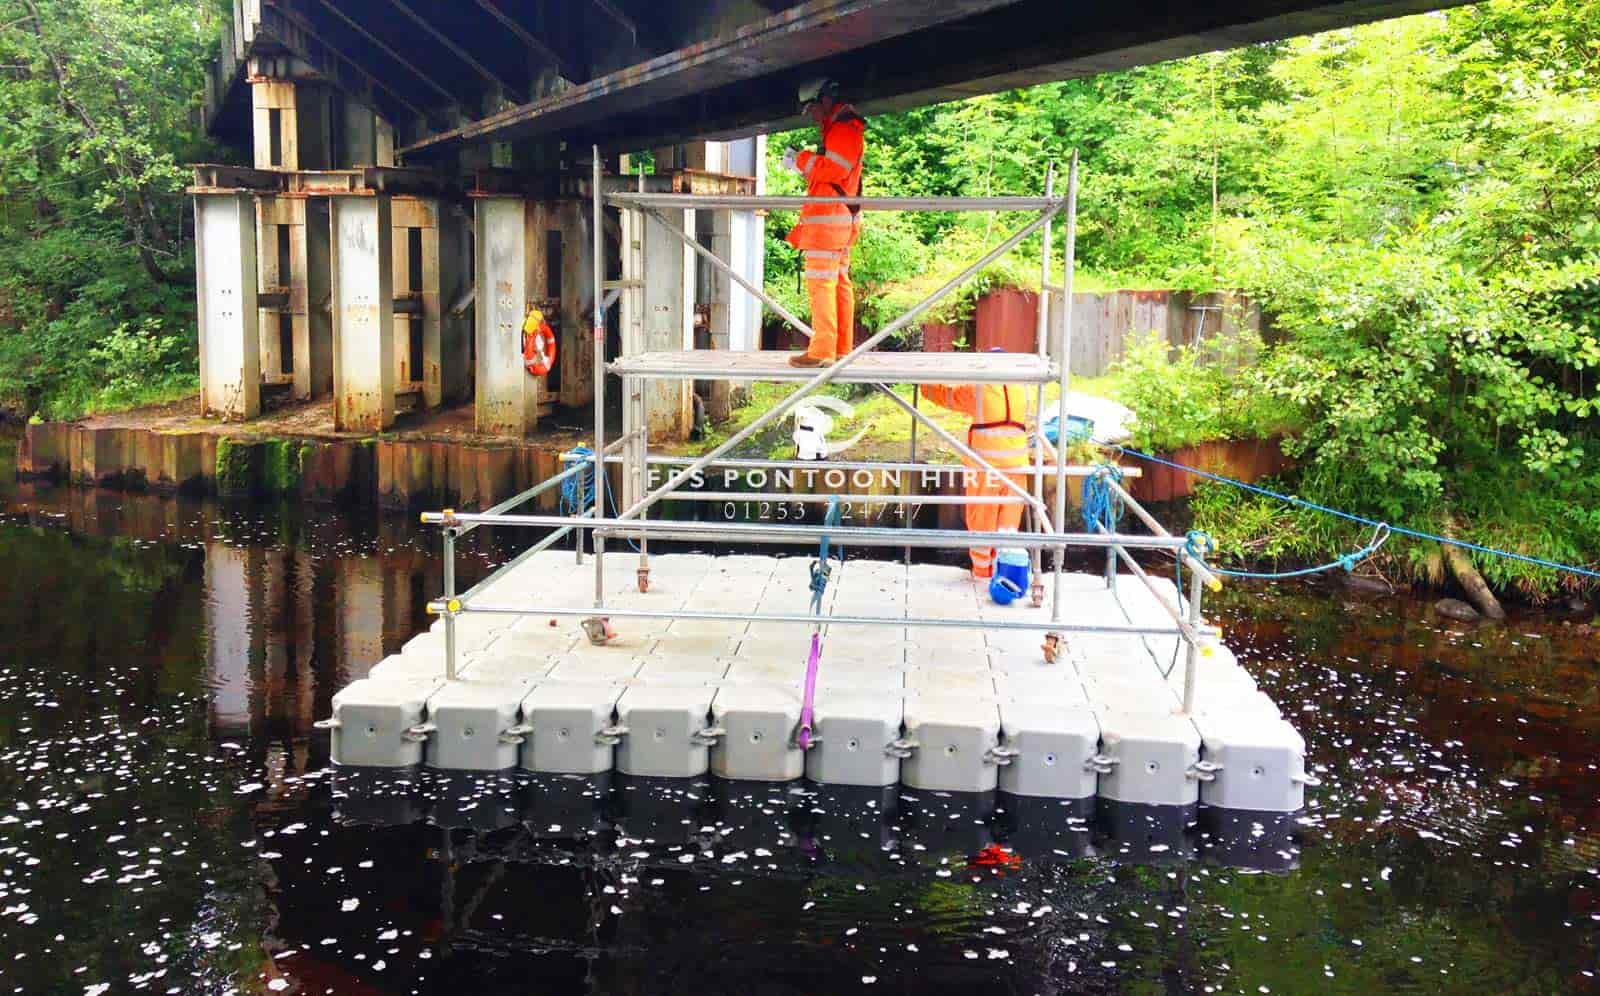 Floating Bridge Inspection Access Pontoons